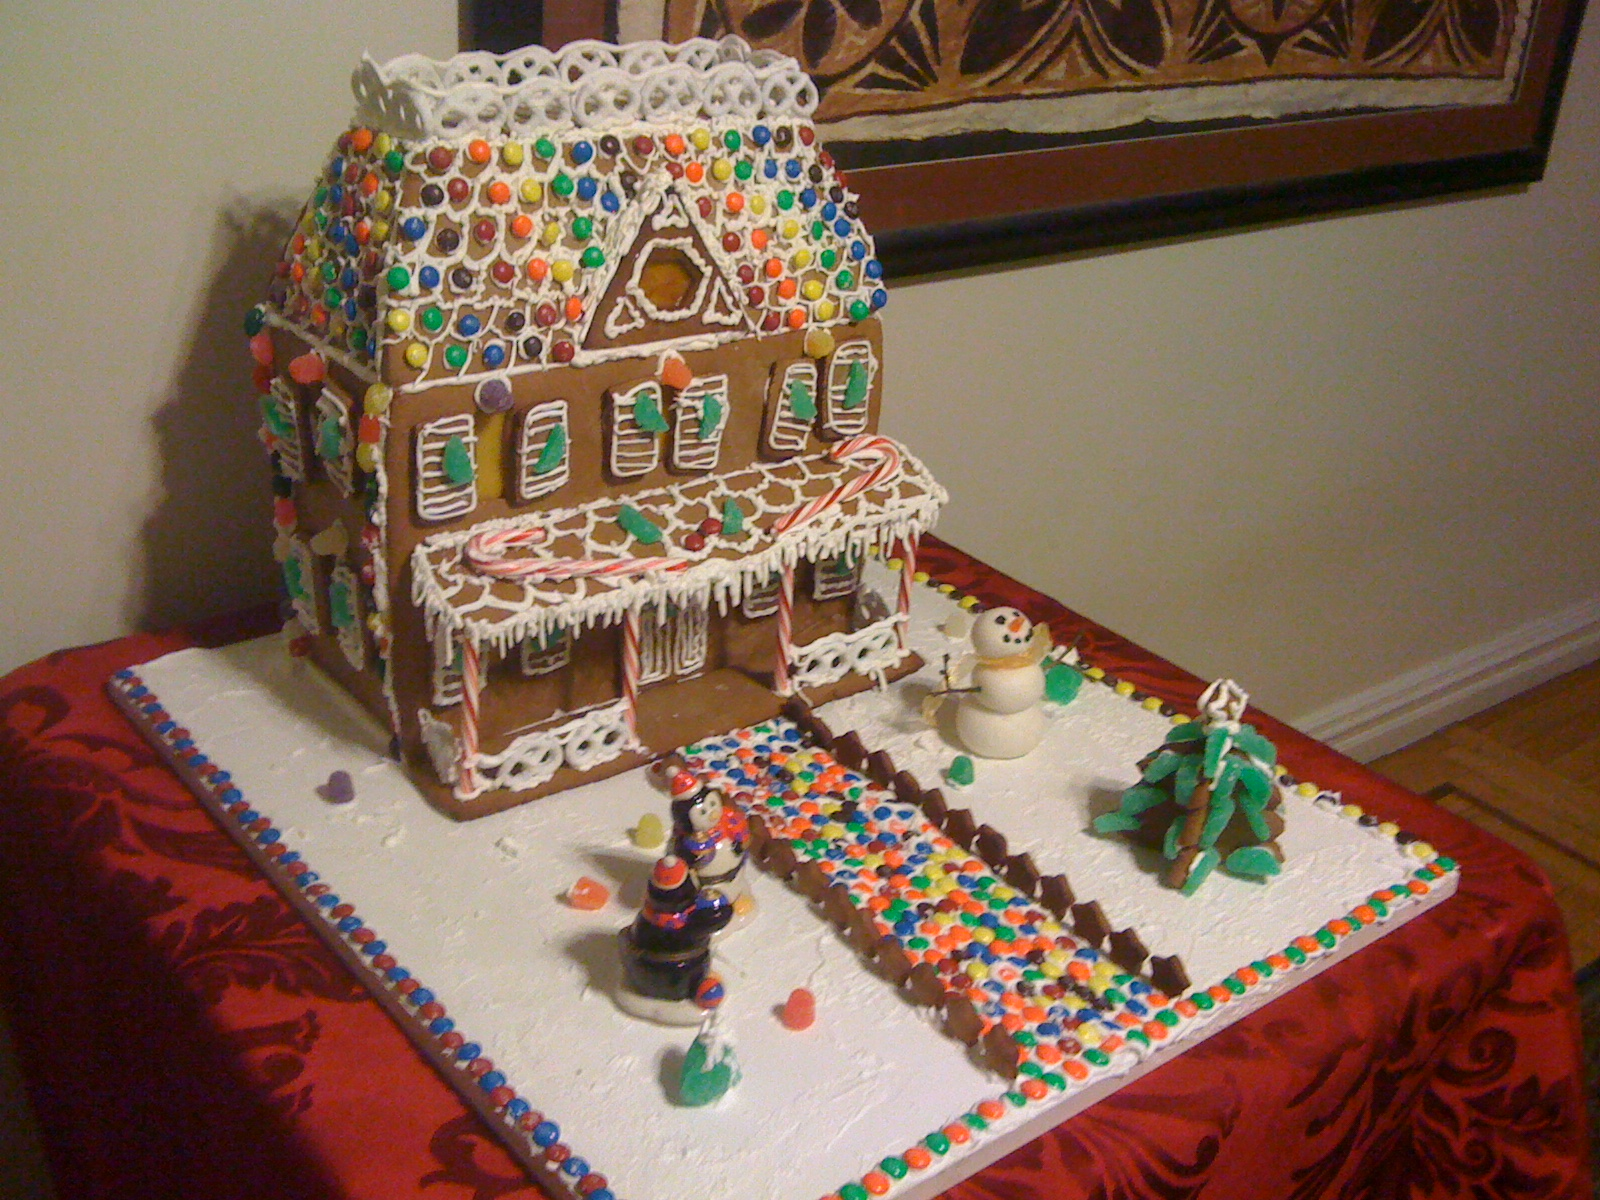 Gingerbread%20house%202011%20003.JPG